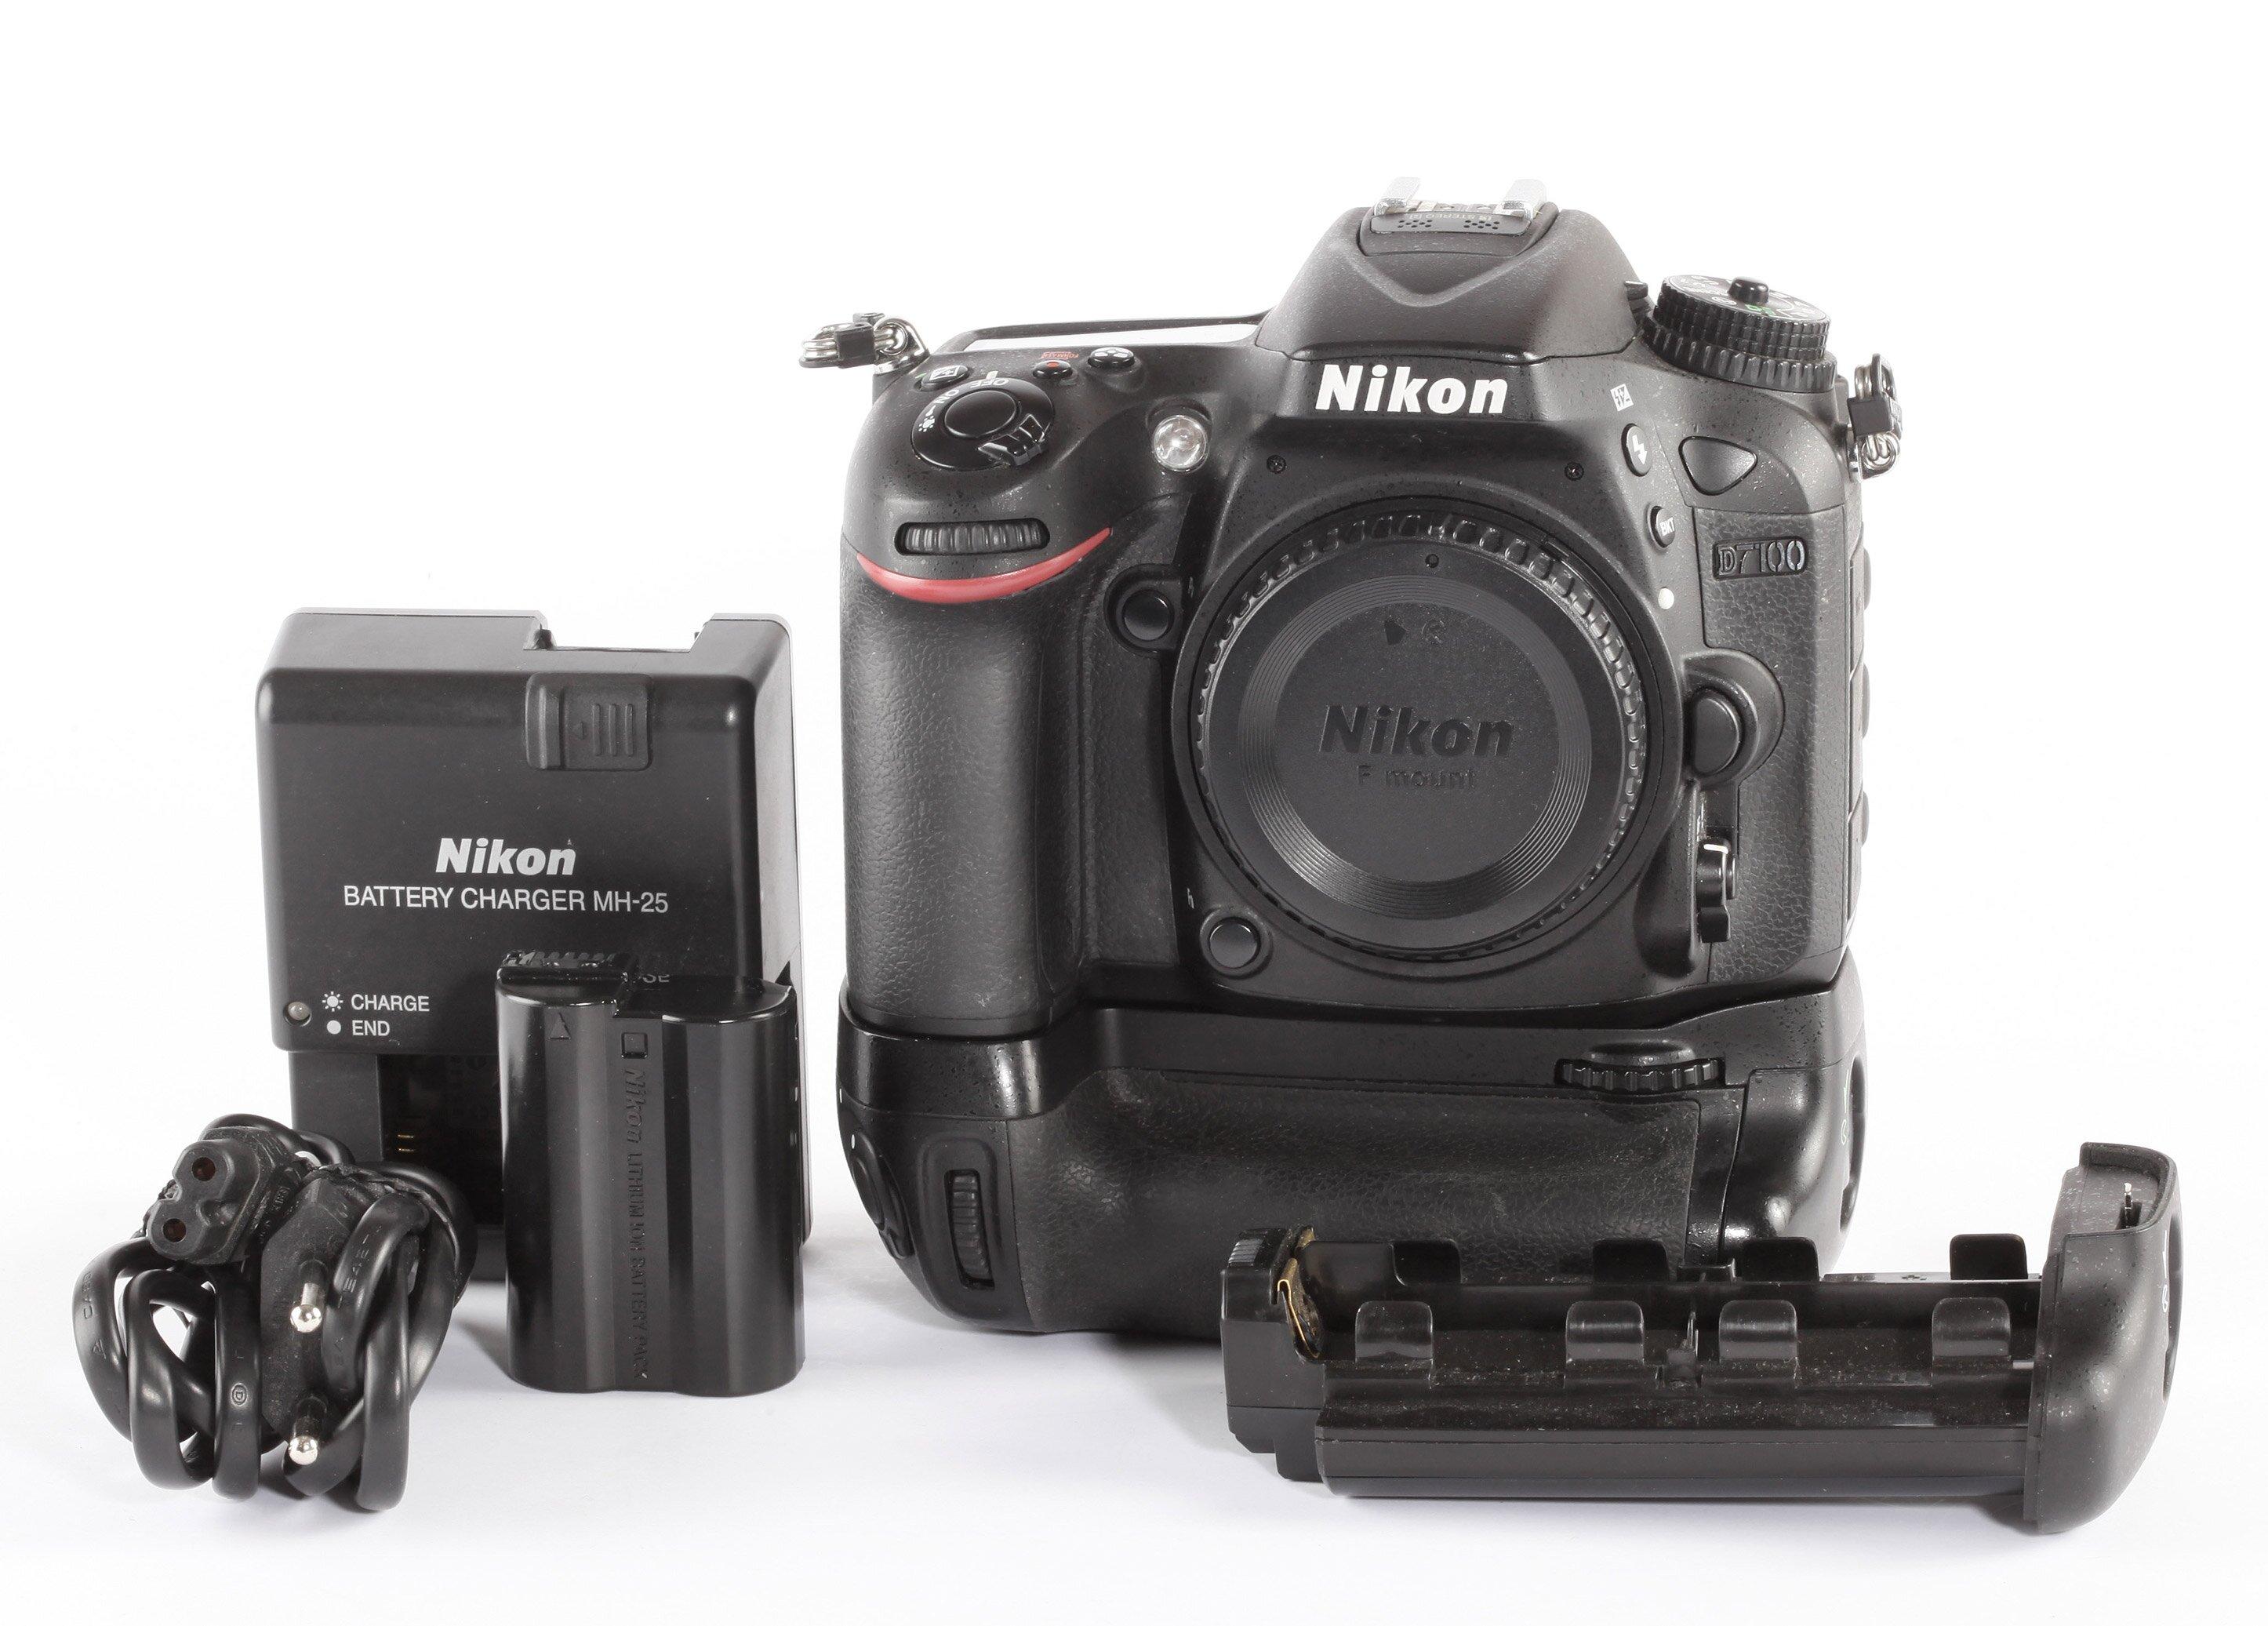 Nikon D7100 Gehäuse 33000 Auslösungen